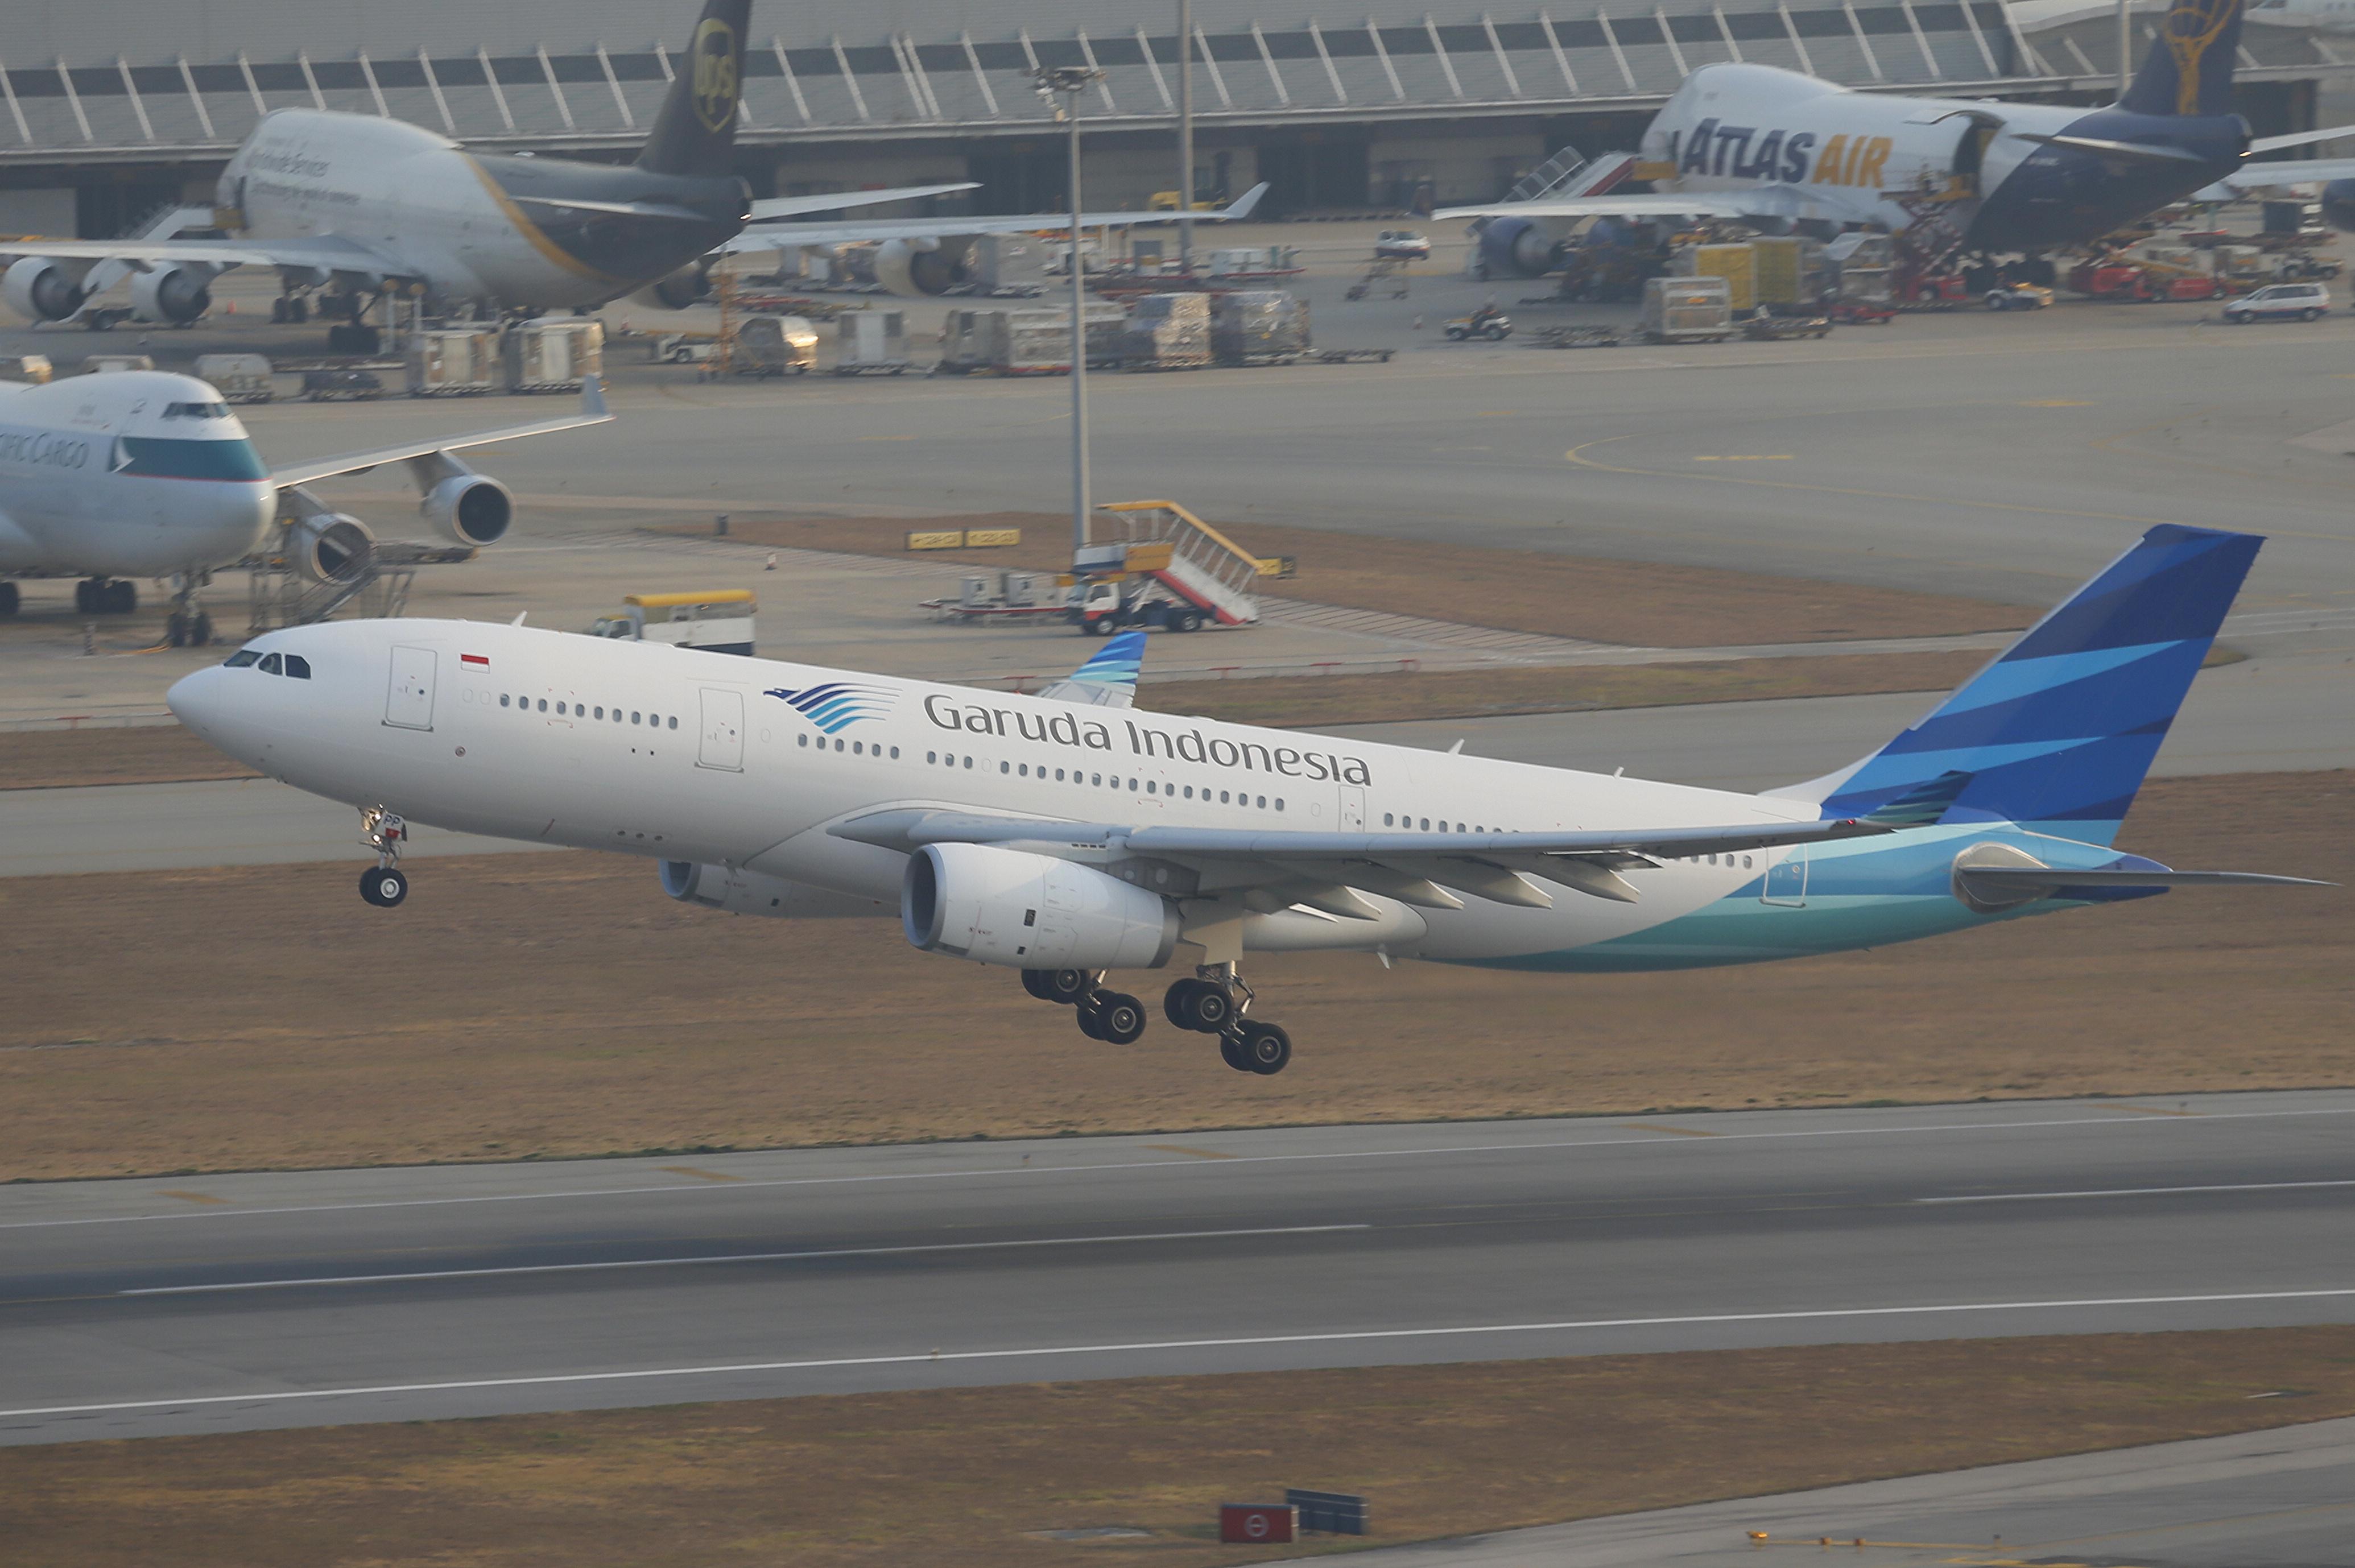 Garuda Indonesia Airbus A300 B4